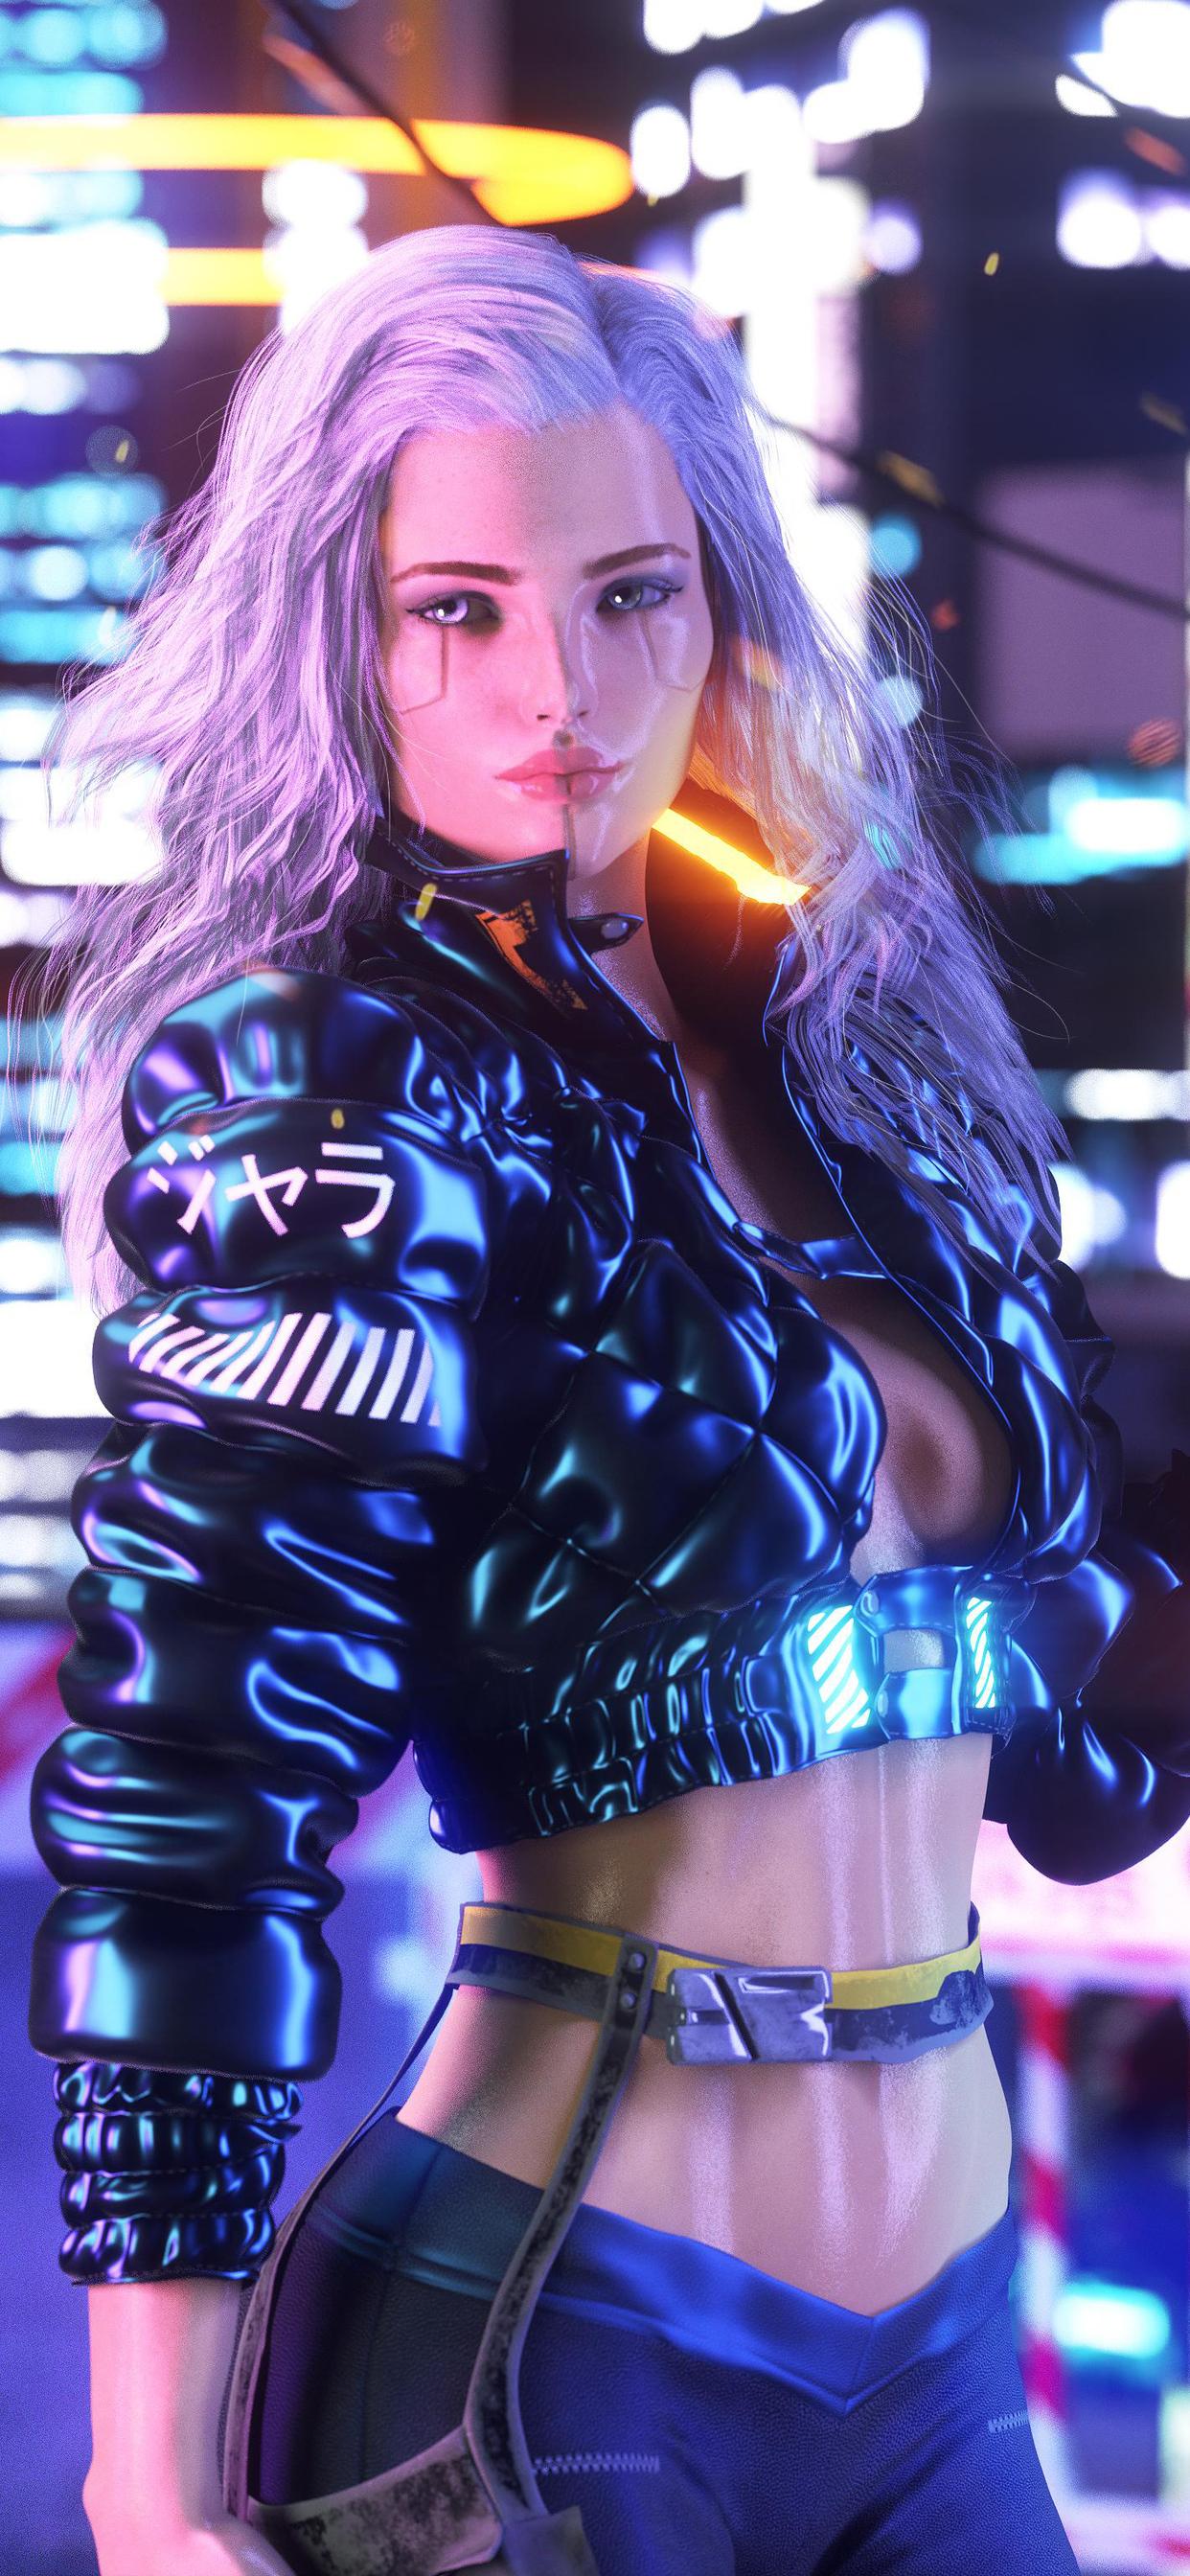 1242x2688 Cyberpunk Girl With Gun Artwork Iphone XS MAX HD ...